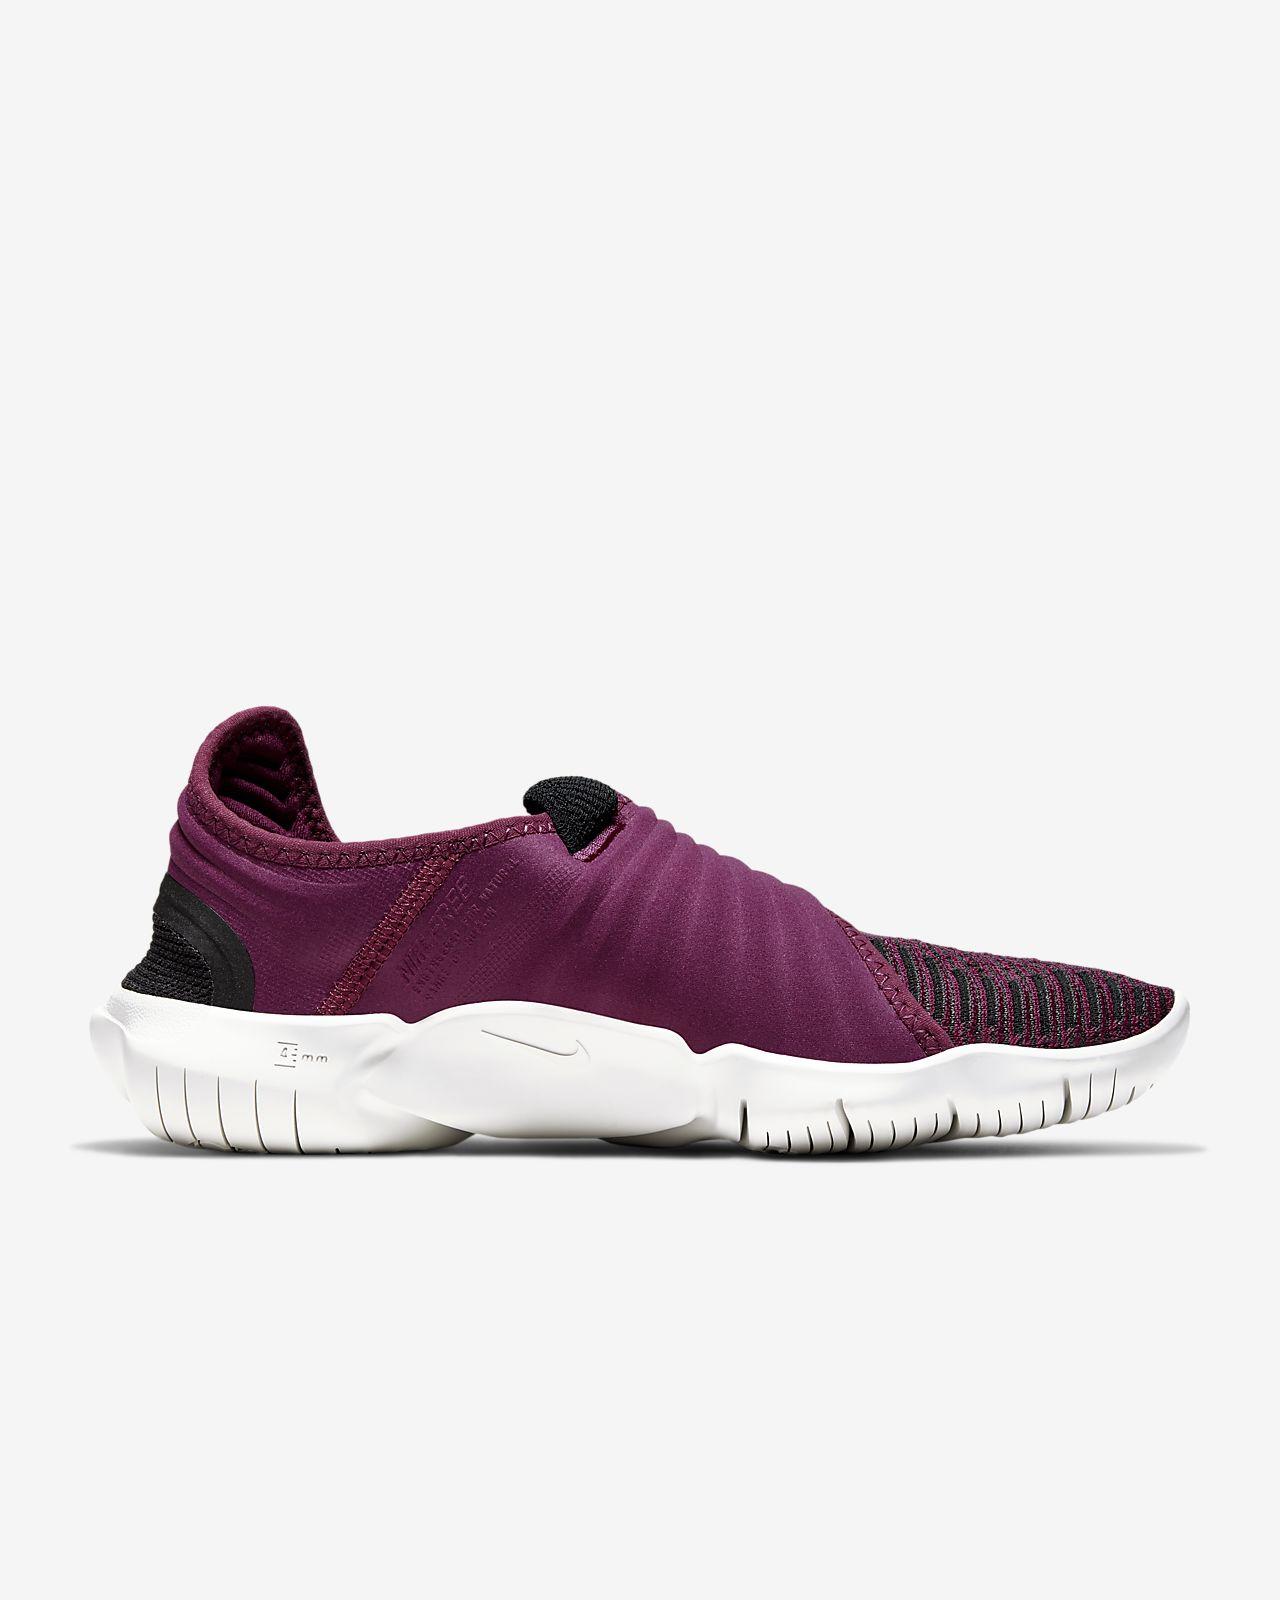 nike free rn flyknit cheap running shoe, NIKE Boys